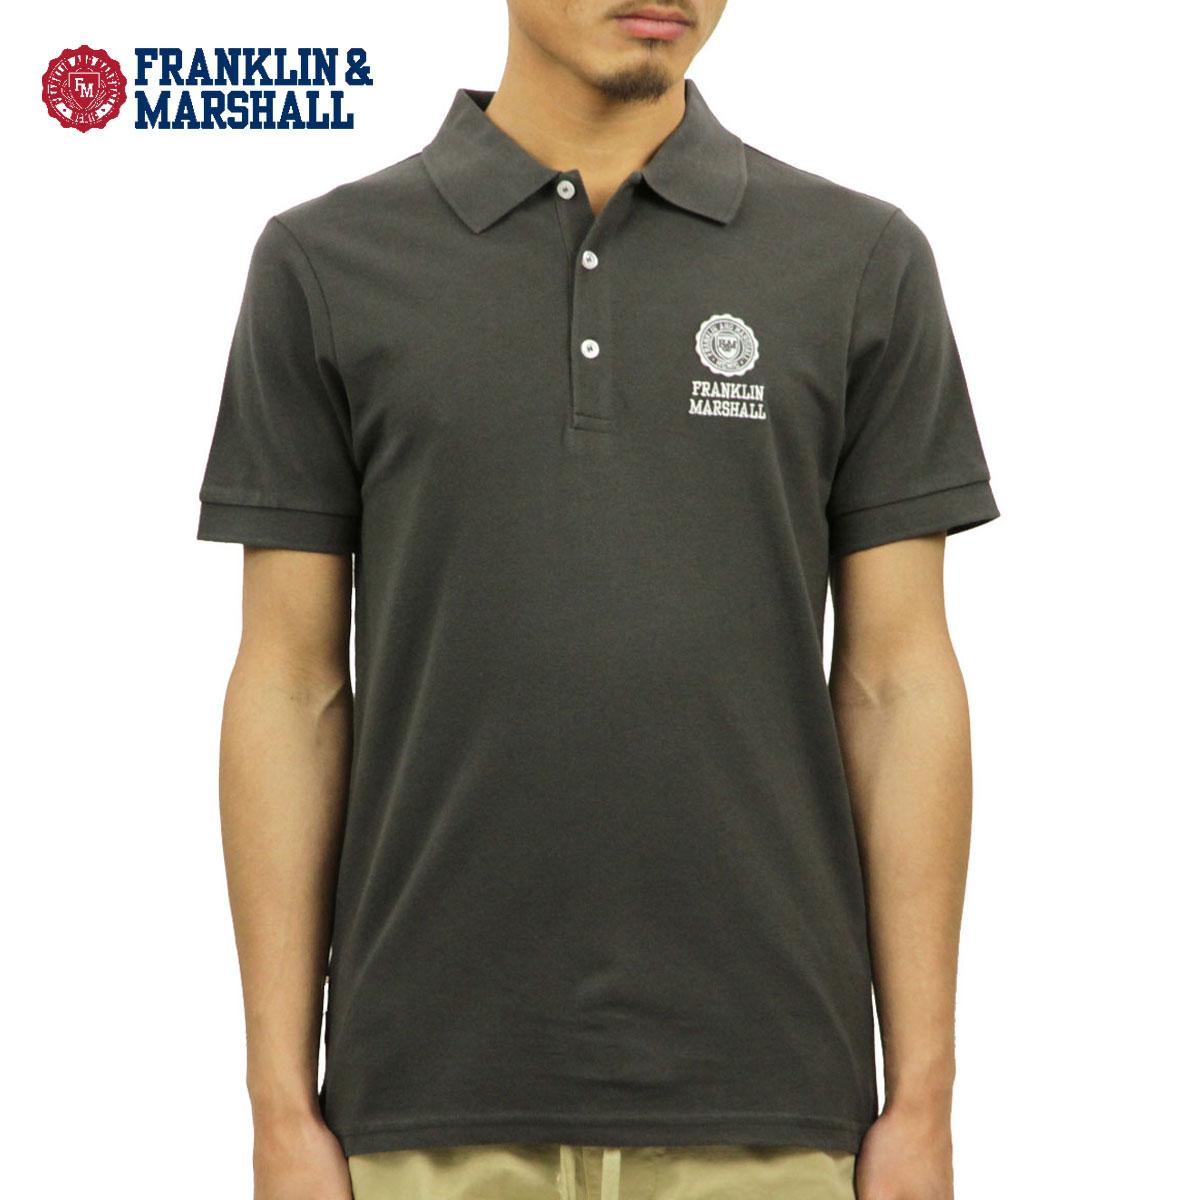 5ff341e5 Franklin Marshal FRANKLIN & MARSHALL regular store men short sleeves  polo shirt POLO SHIRT SHADOW ...